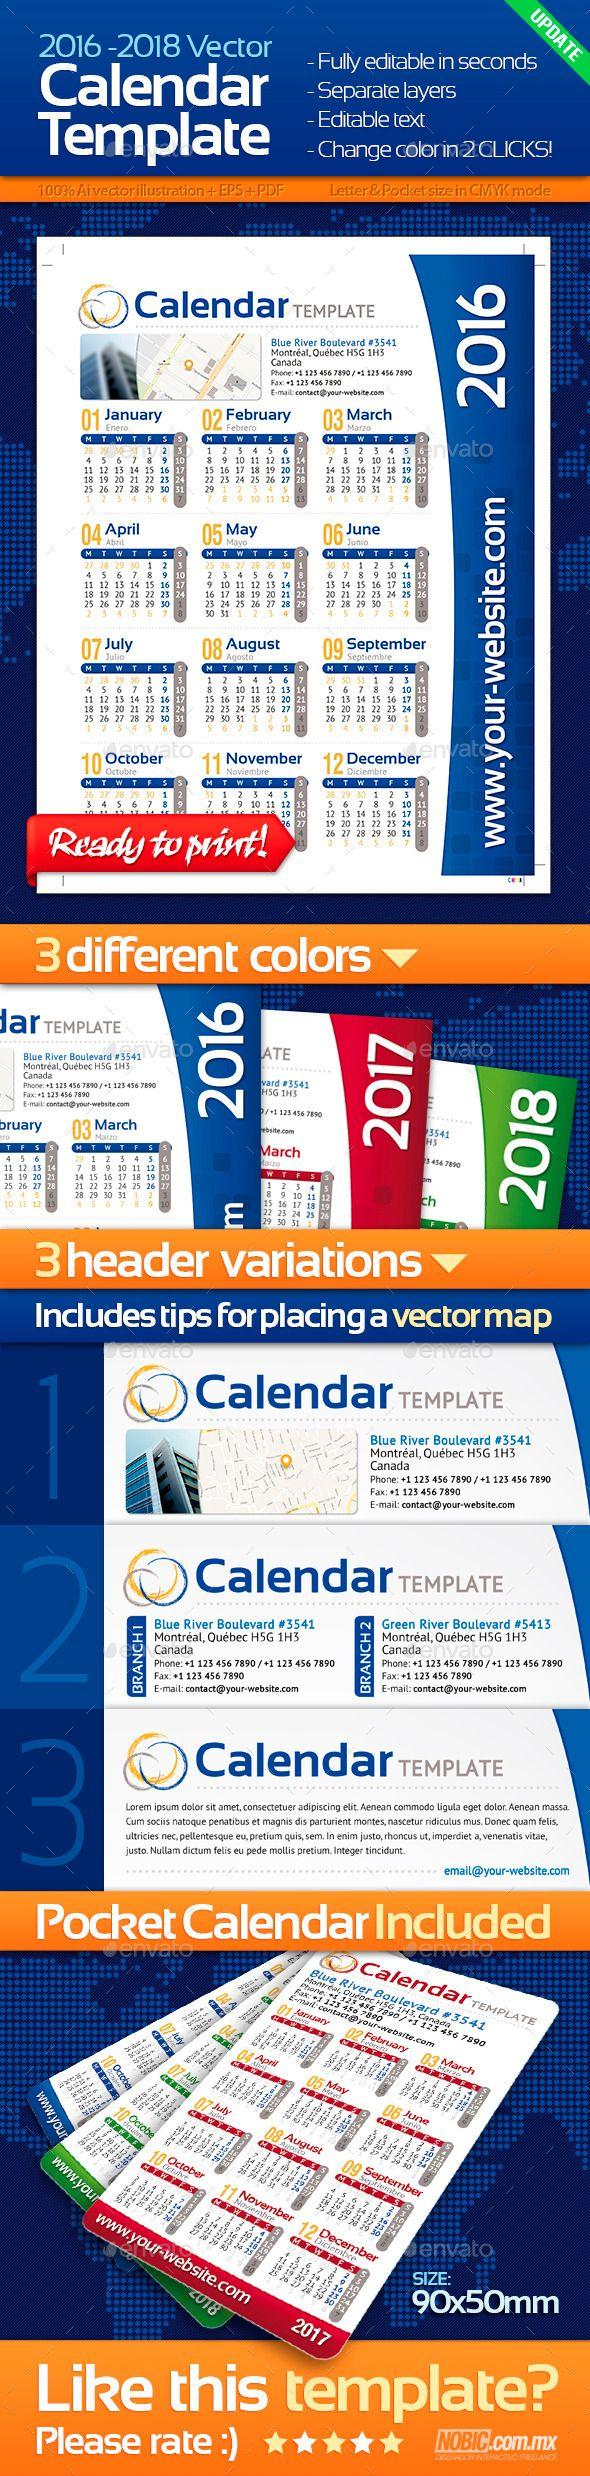 2015 and 2018 calendar template